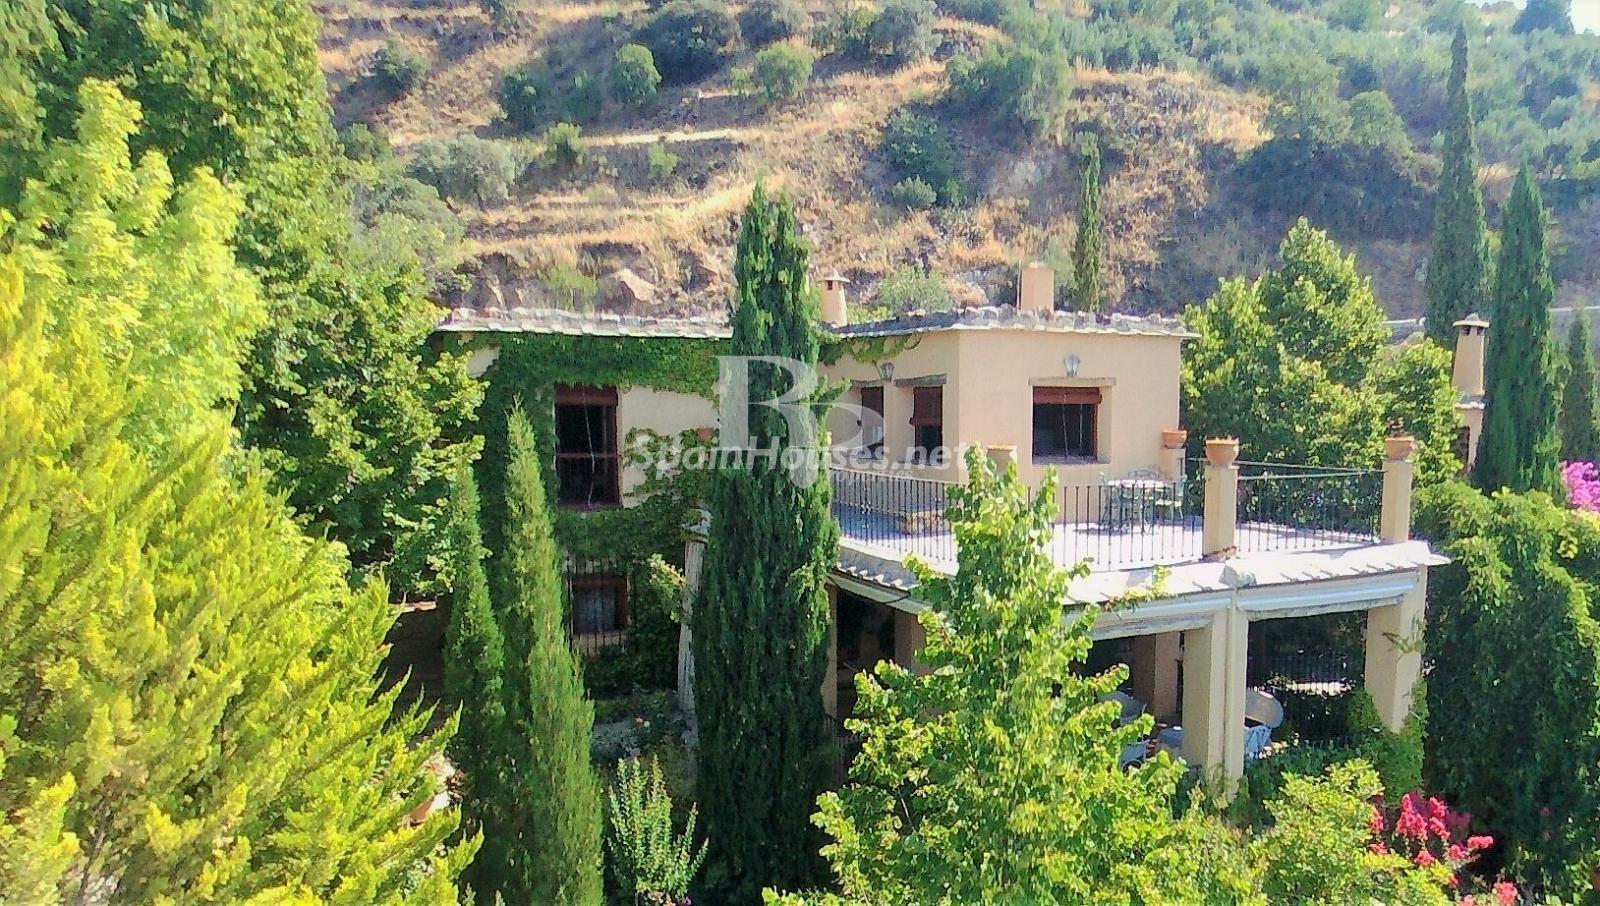 79874050 3157227 foto124480367 - An idyllic natural site in this charming Andalusian farmhouse in Órgiva, La Alpujarra, Granada